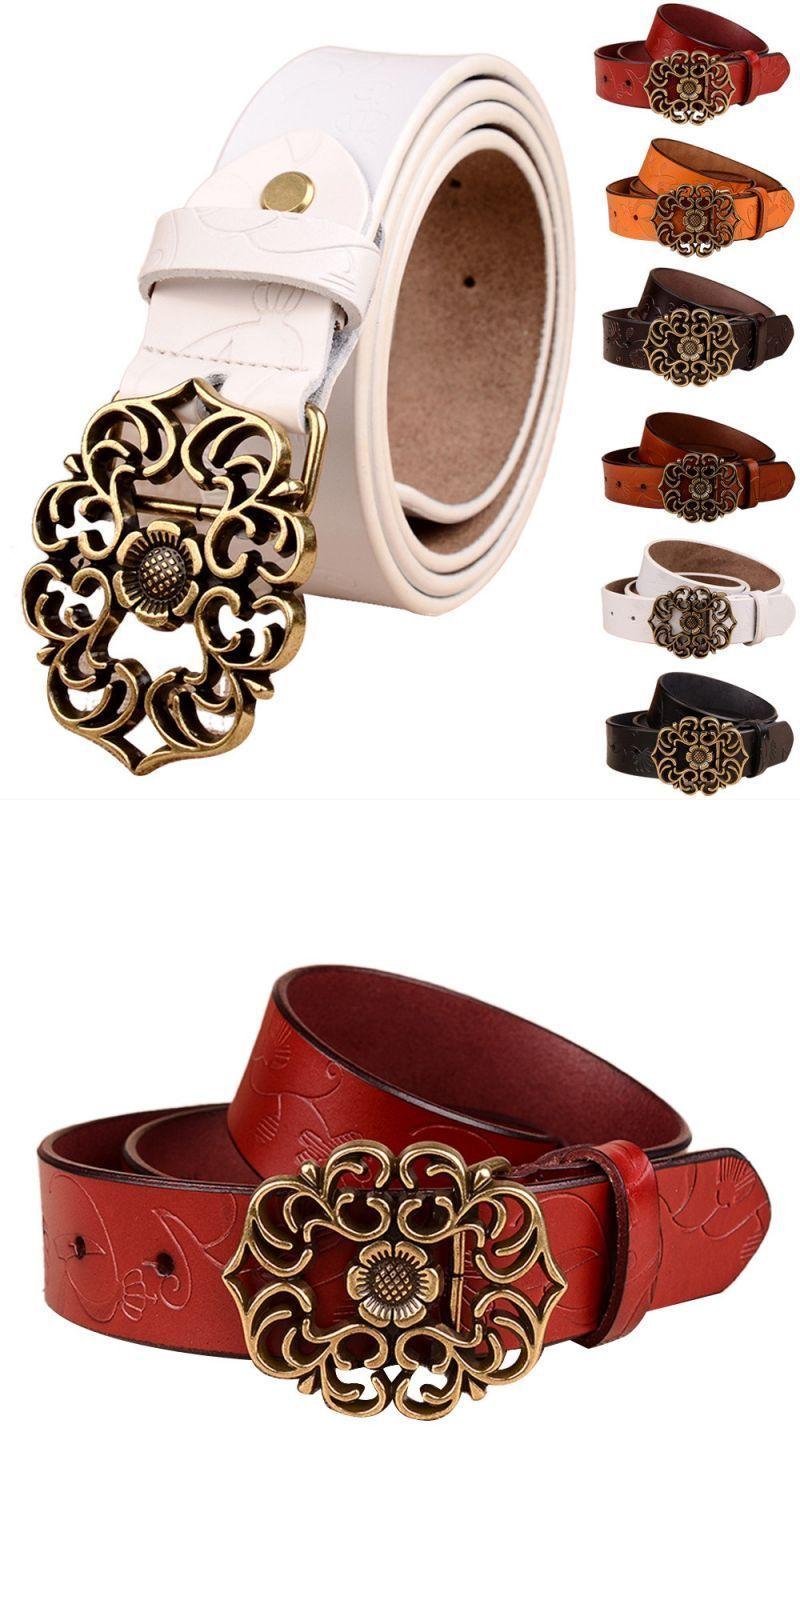 Best Selling Ms Flower Antique Palace Retro Fashion Belt Designer Belts Women Belts Waist Cinturon Mujer Bayan Ke Belts For Women Fashion Belts Designer Belts